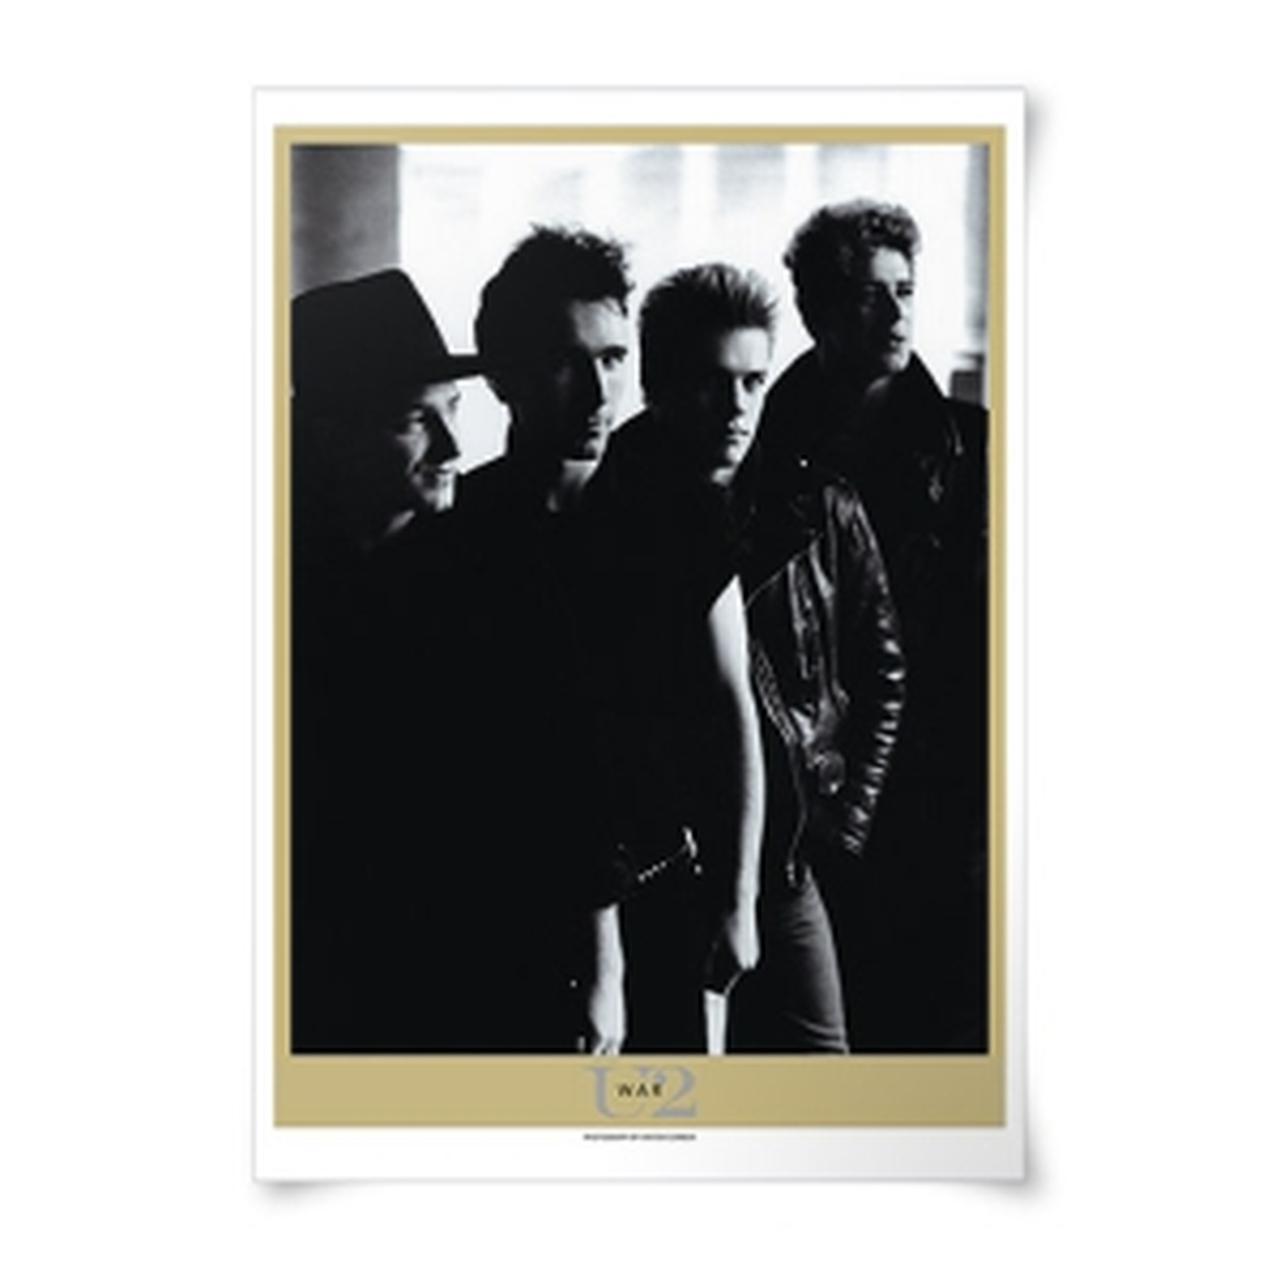 U2 war album lithograph